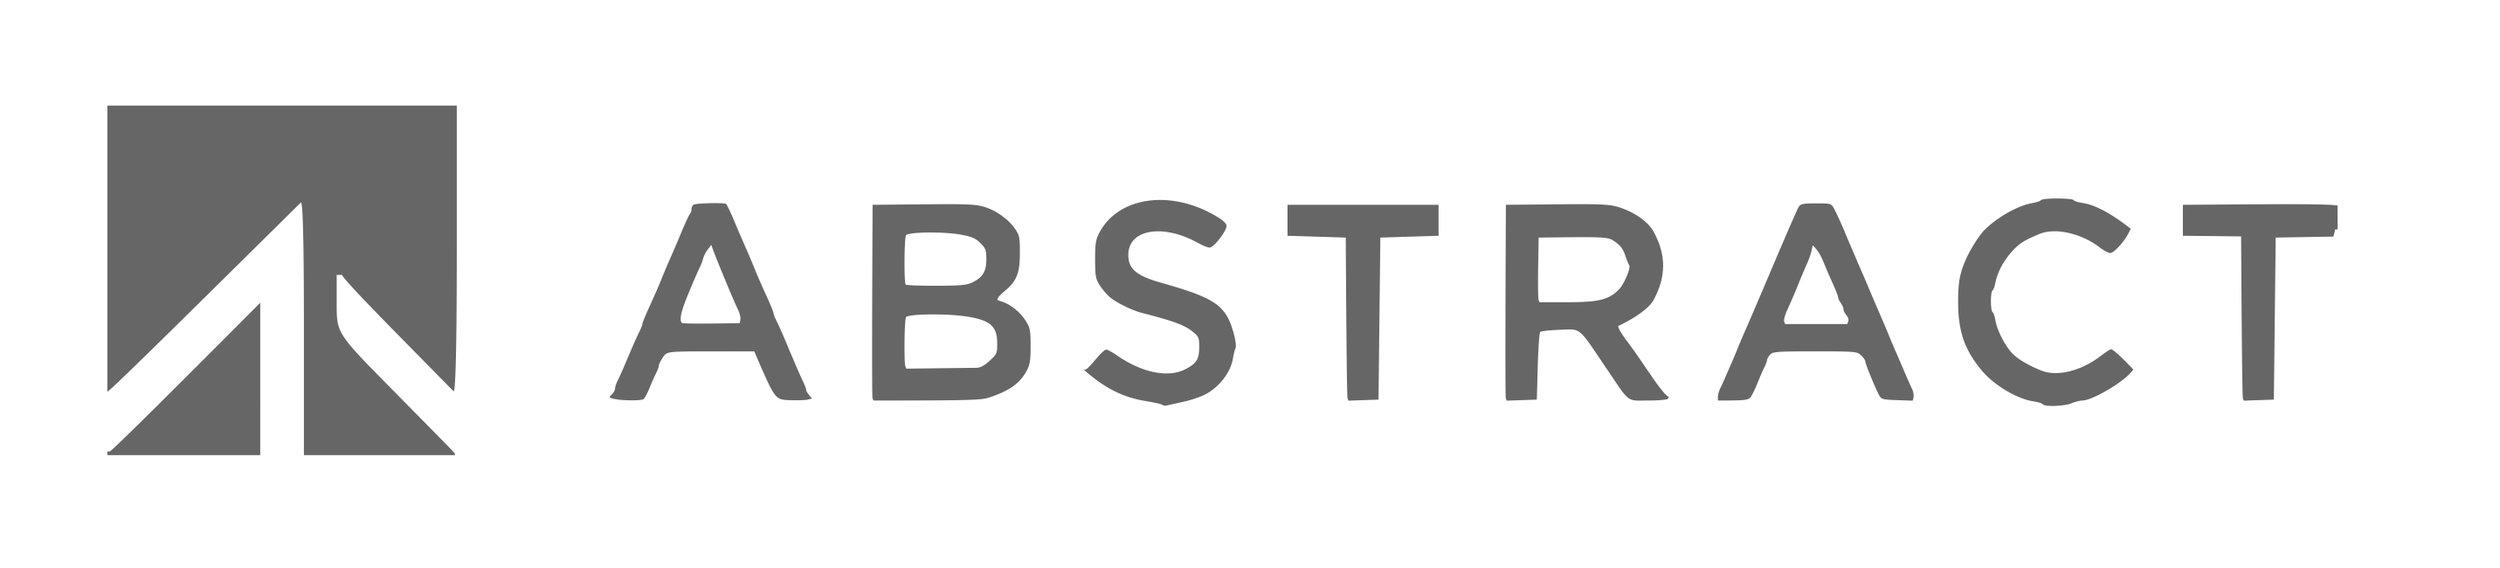 abstract-logo.jpg